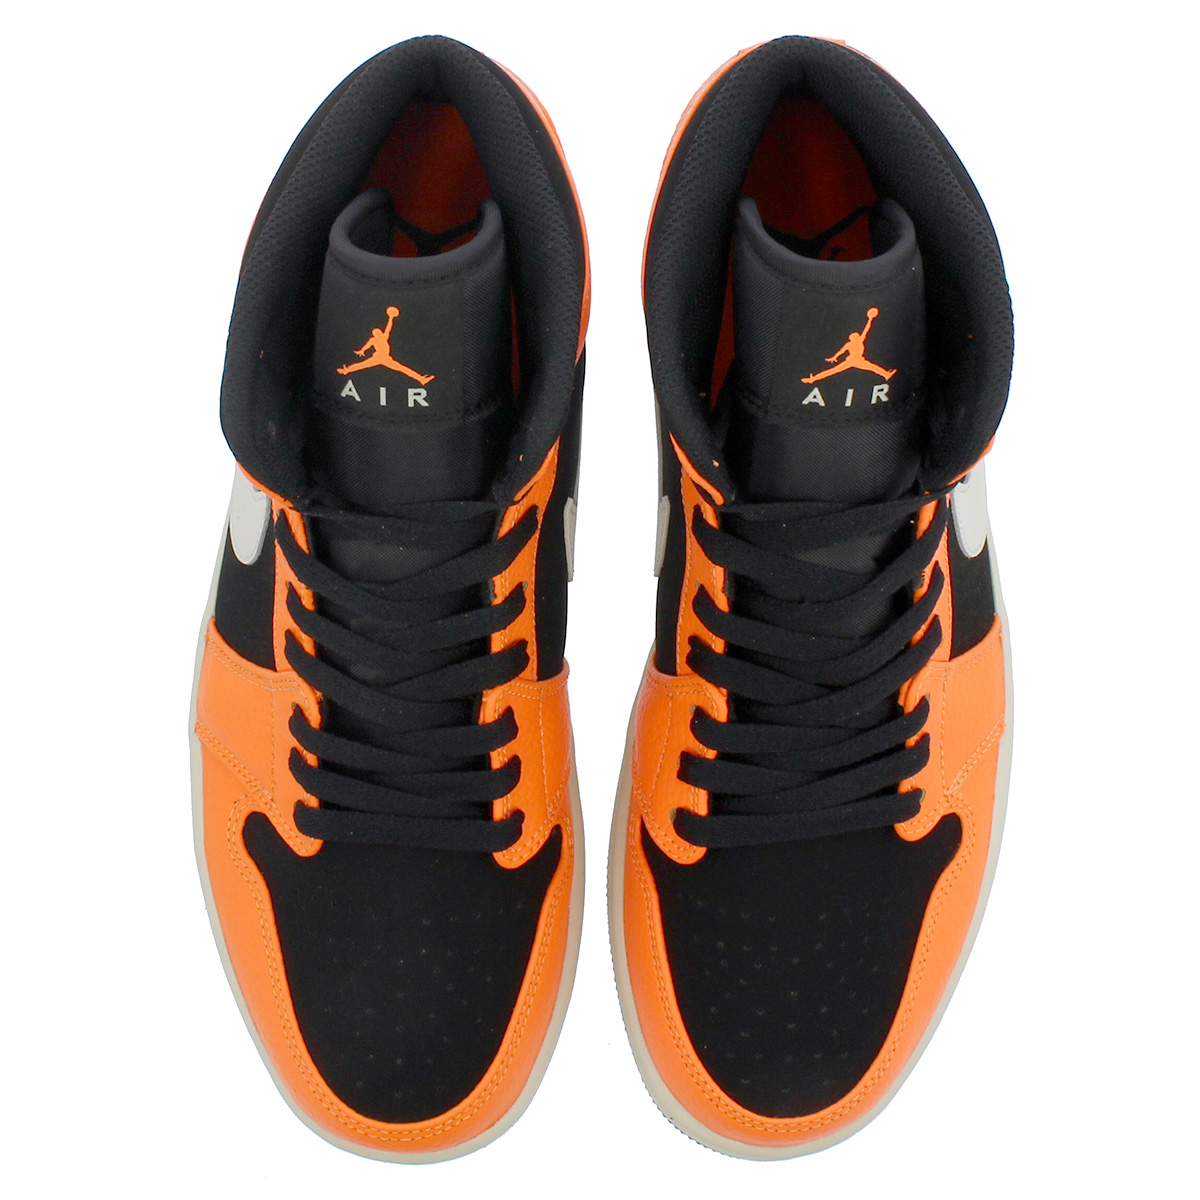 sale retailer a1451 1888e NIKE AIR JORDAN 1 MID Nike Air Jordan 1 mid BLACK CONE LIGHT BONE ORANGE  554,724-062